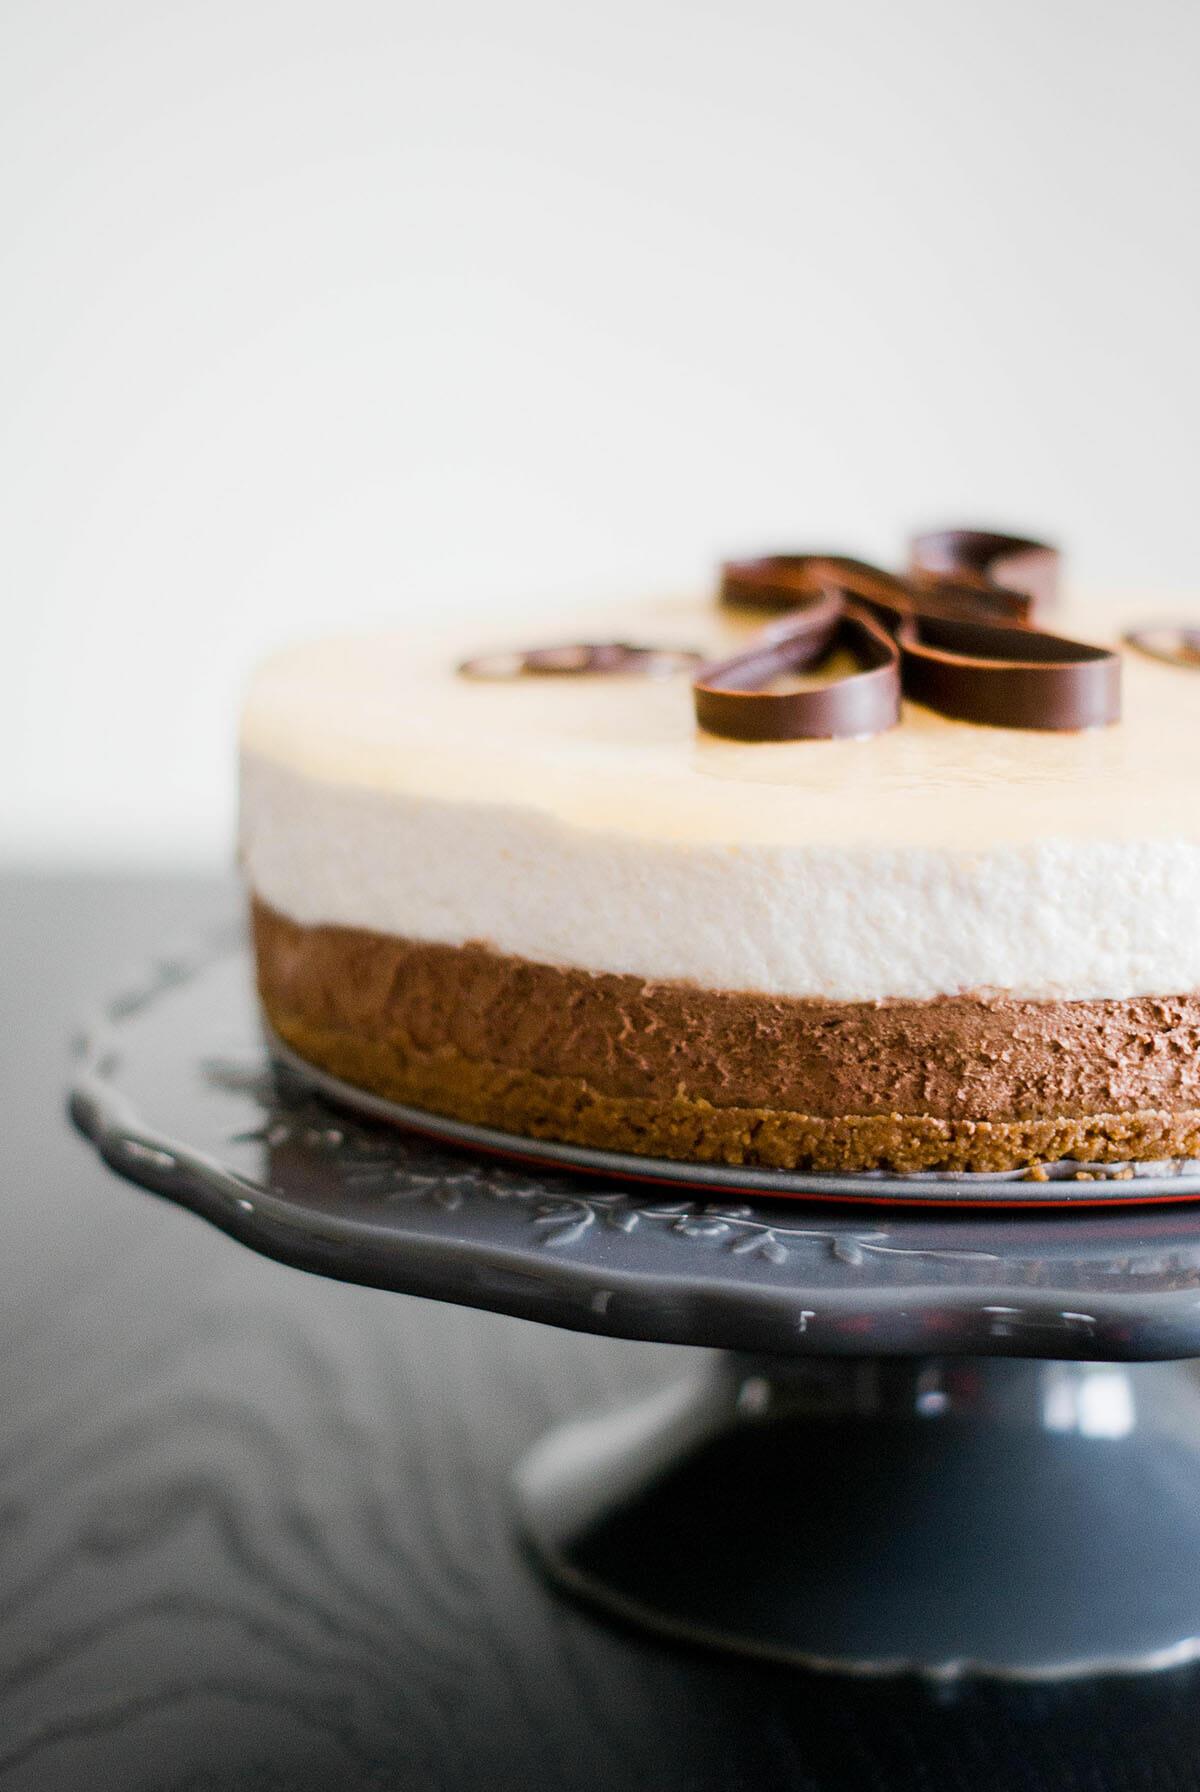 Bavarois Poire Chocolat Sur Craquant Speculoos Lilie Bakery